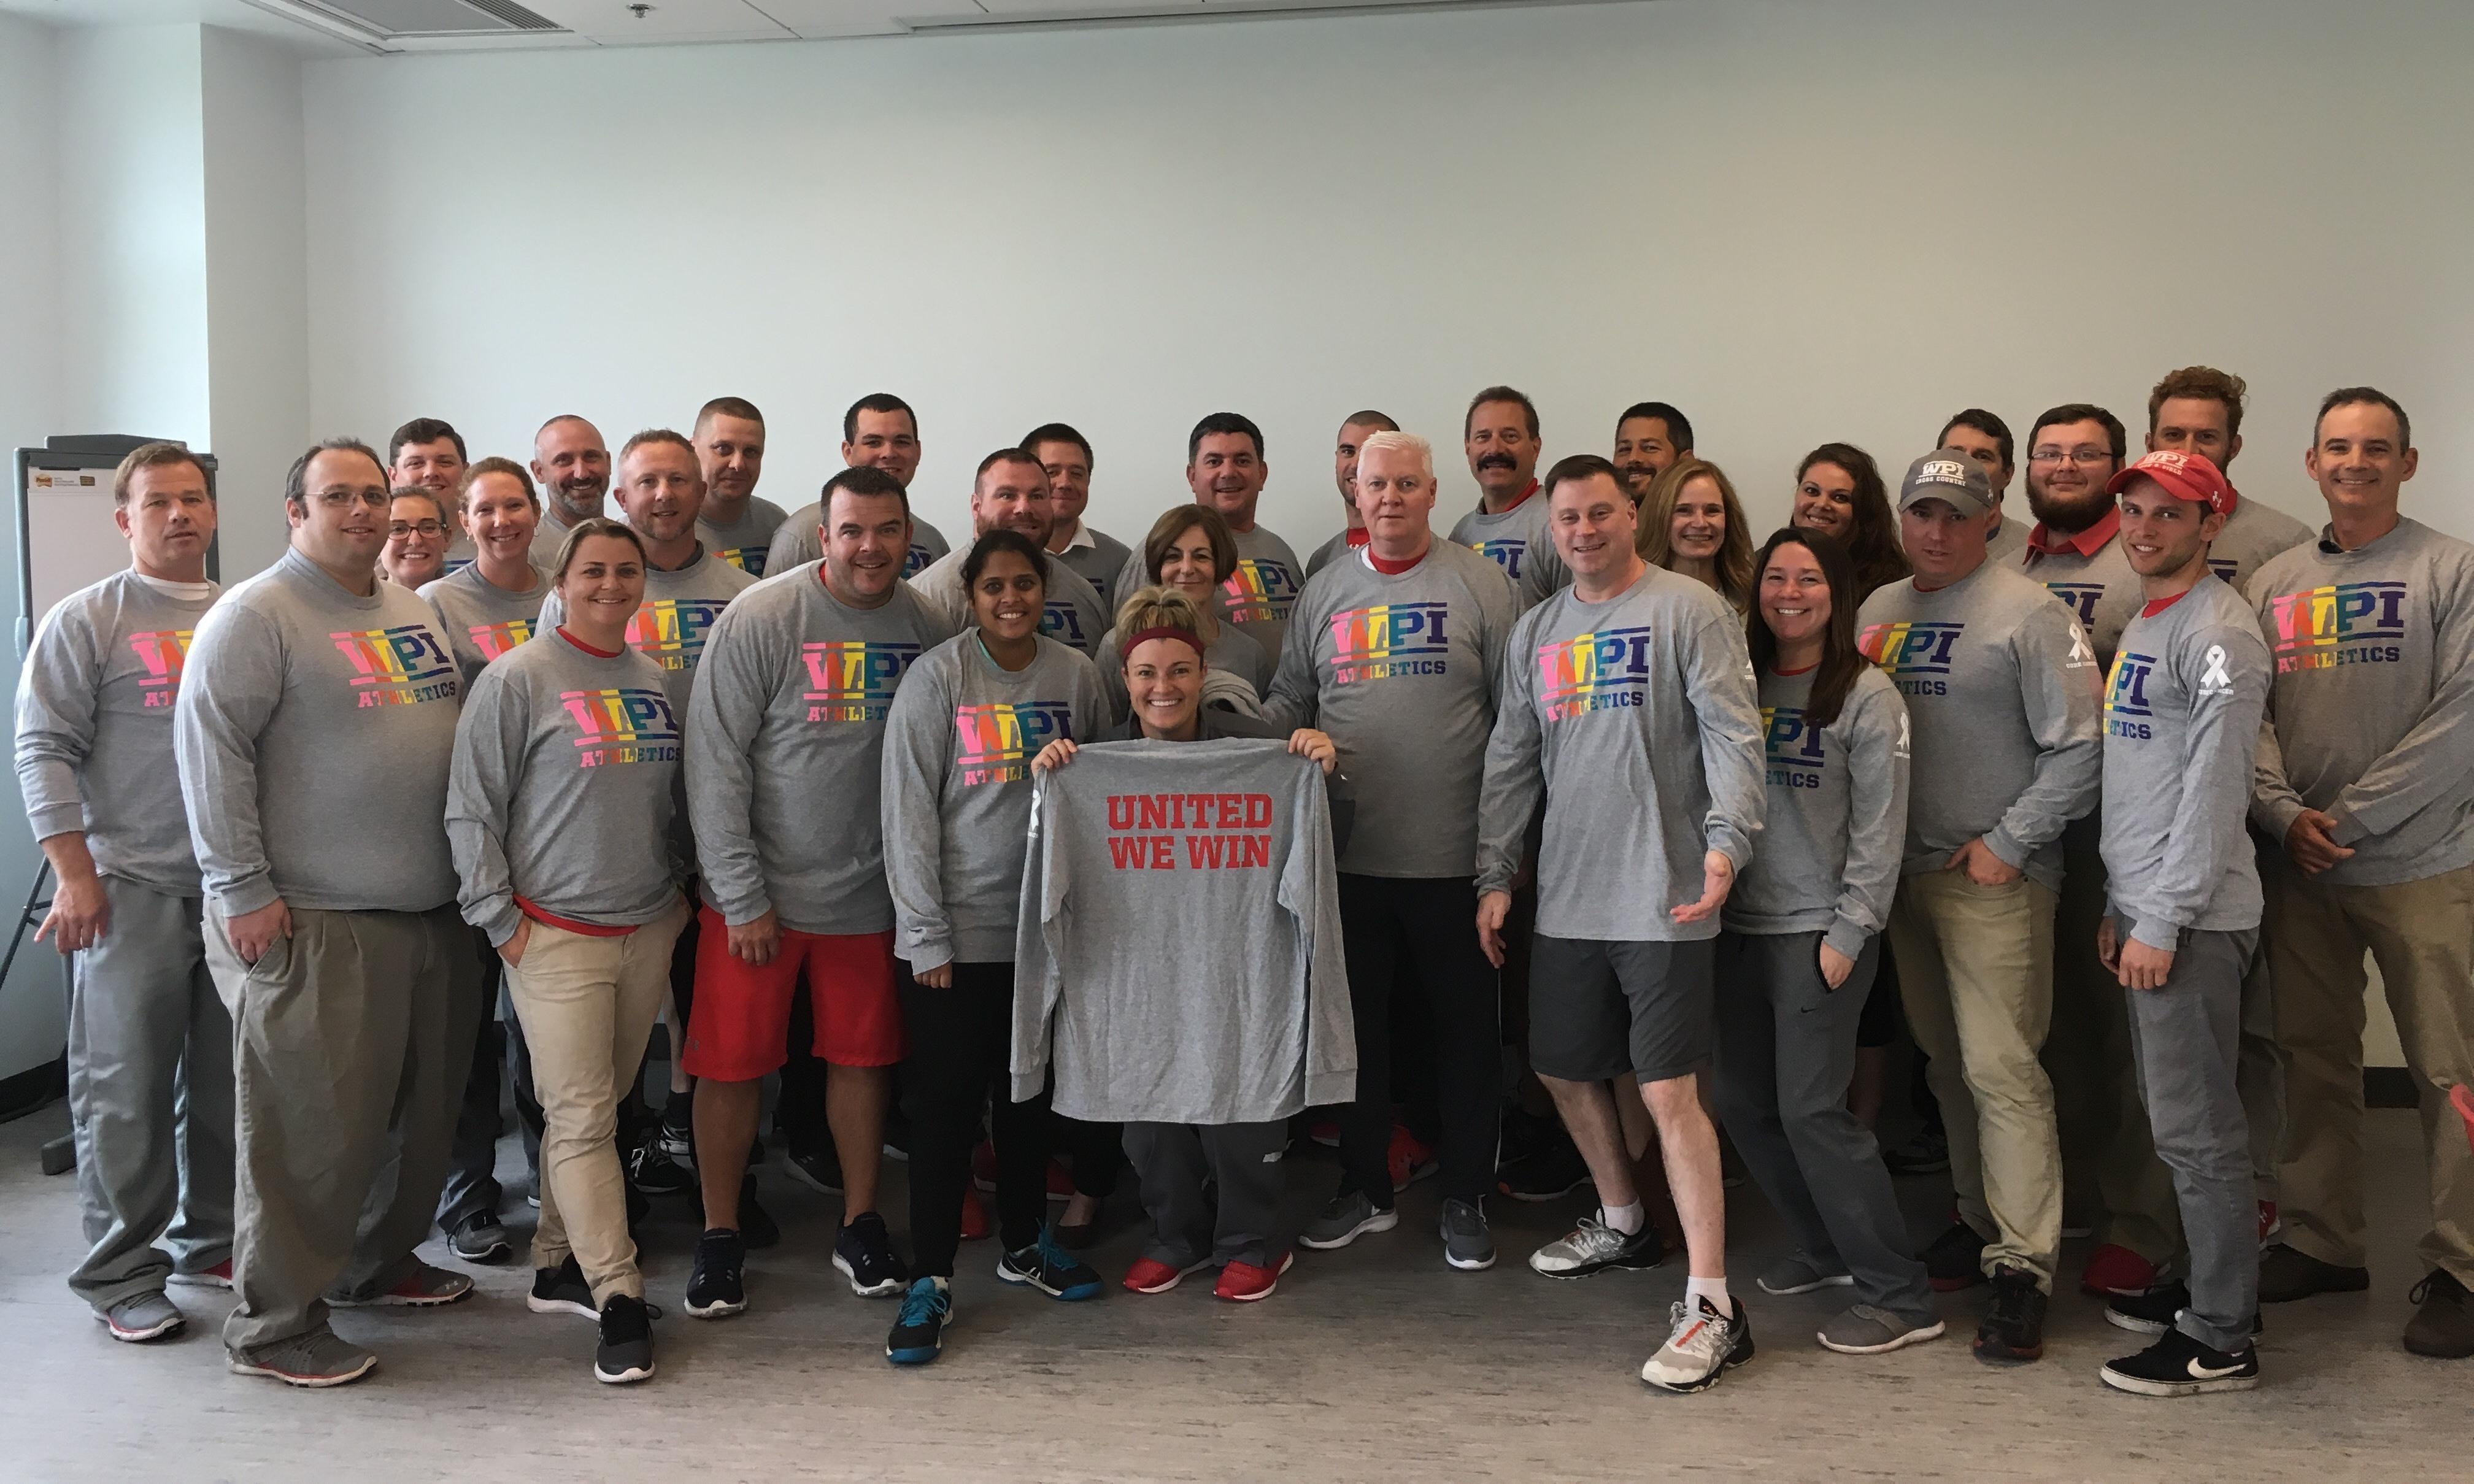 Staff sporting WPI diversity shirts